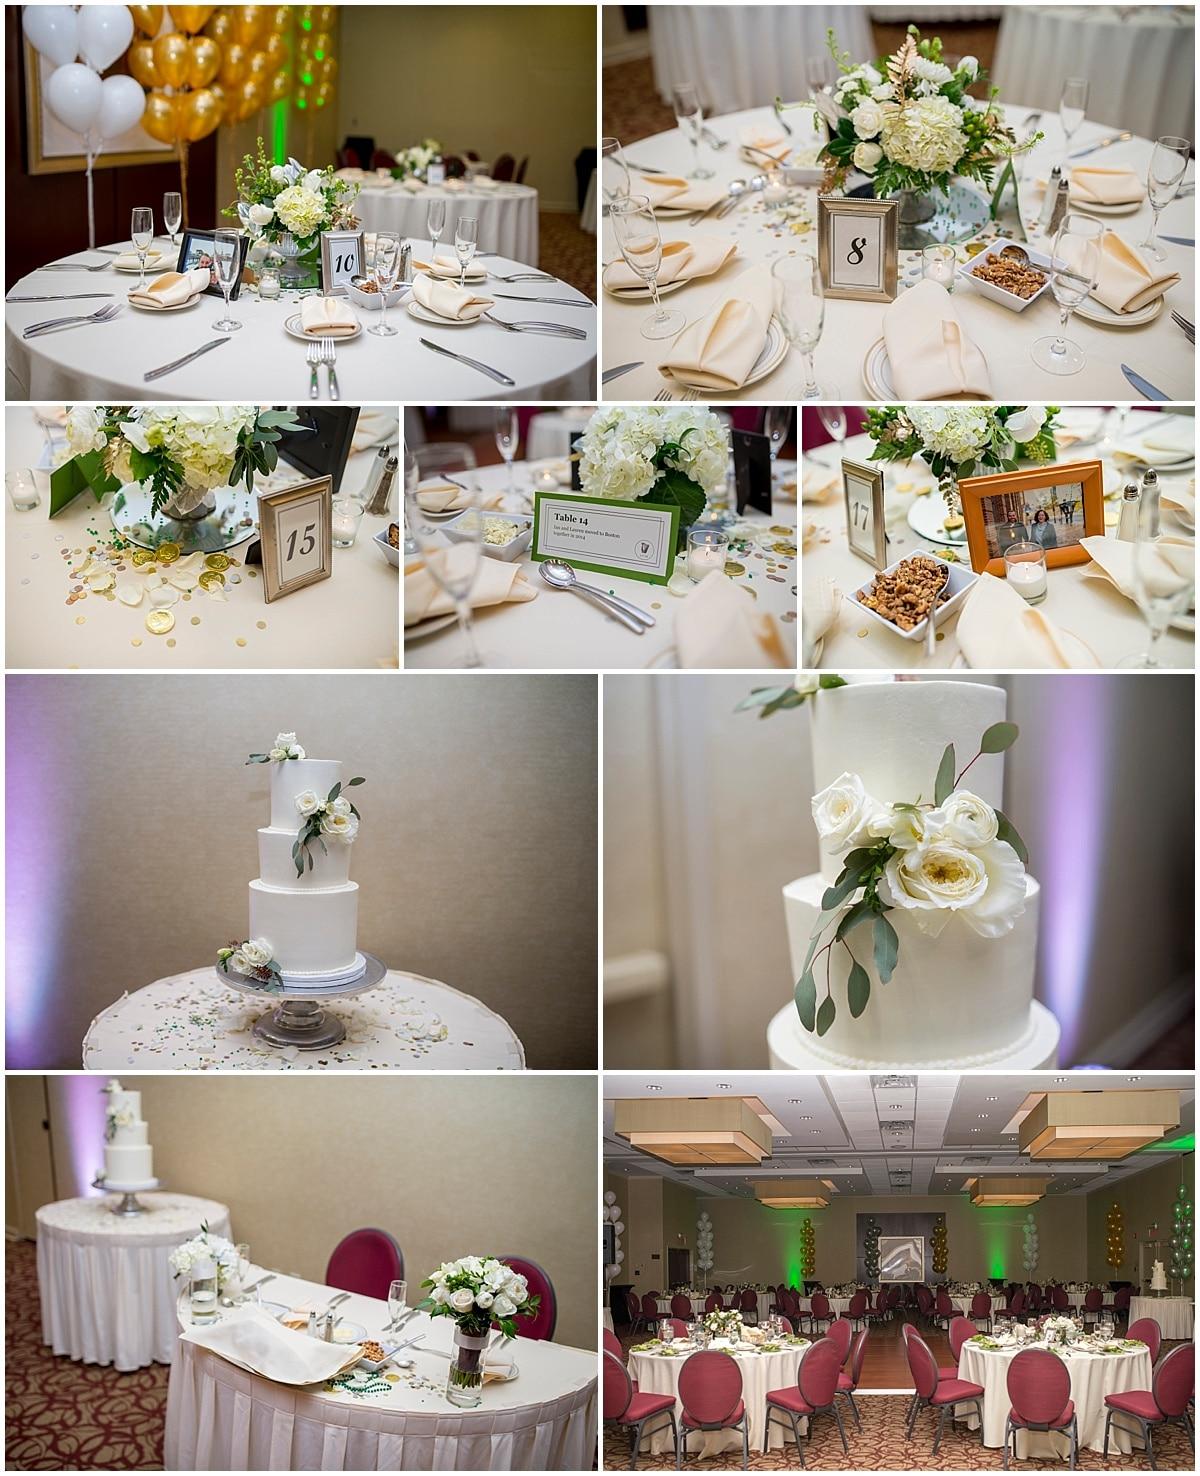 Crowne plaza columbus Ohio wedding